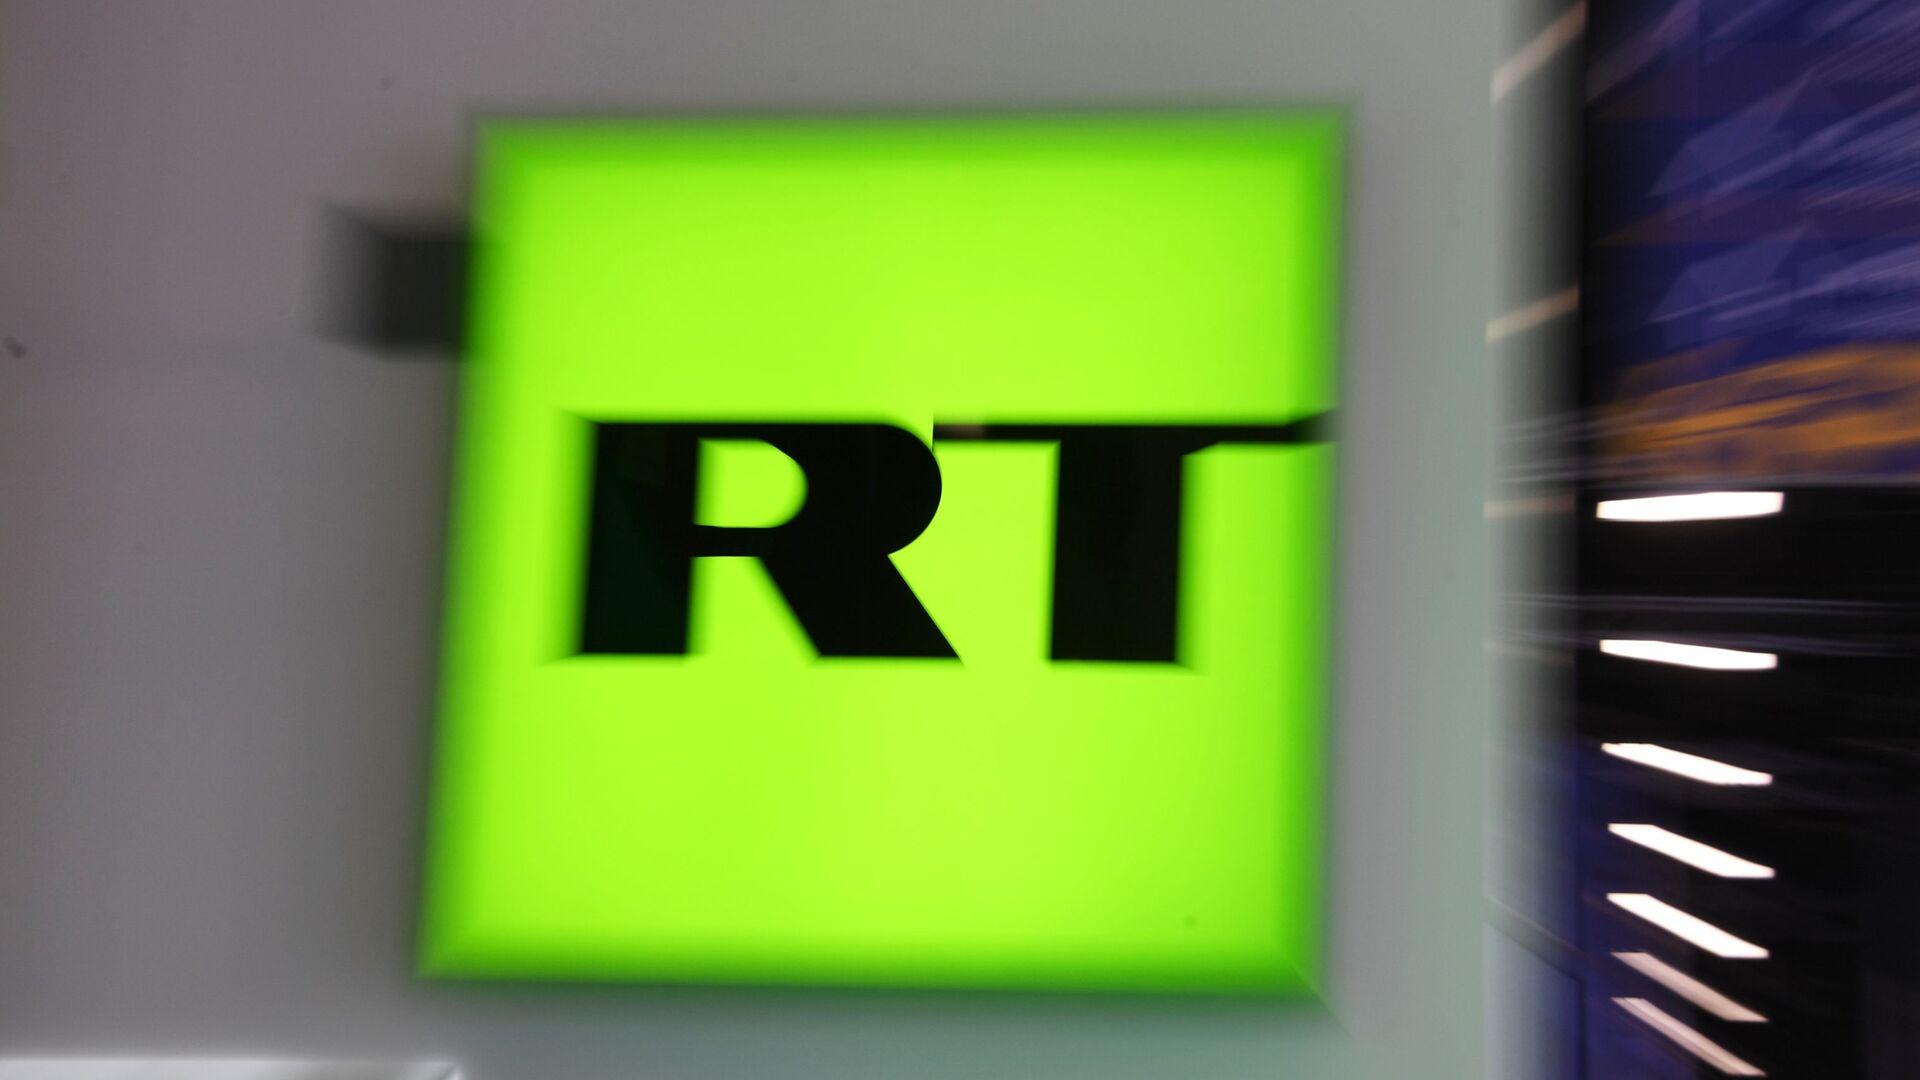 Логотип телеканала RT (Russia Today) - Sputnik Беларусь, 1920, 28.09.2021